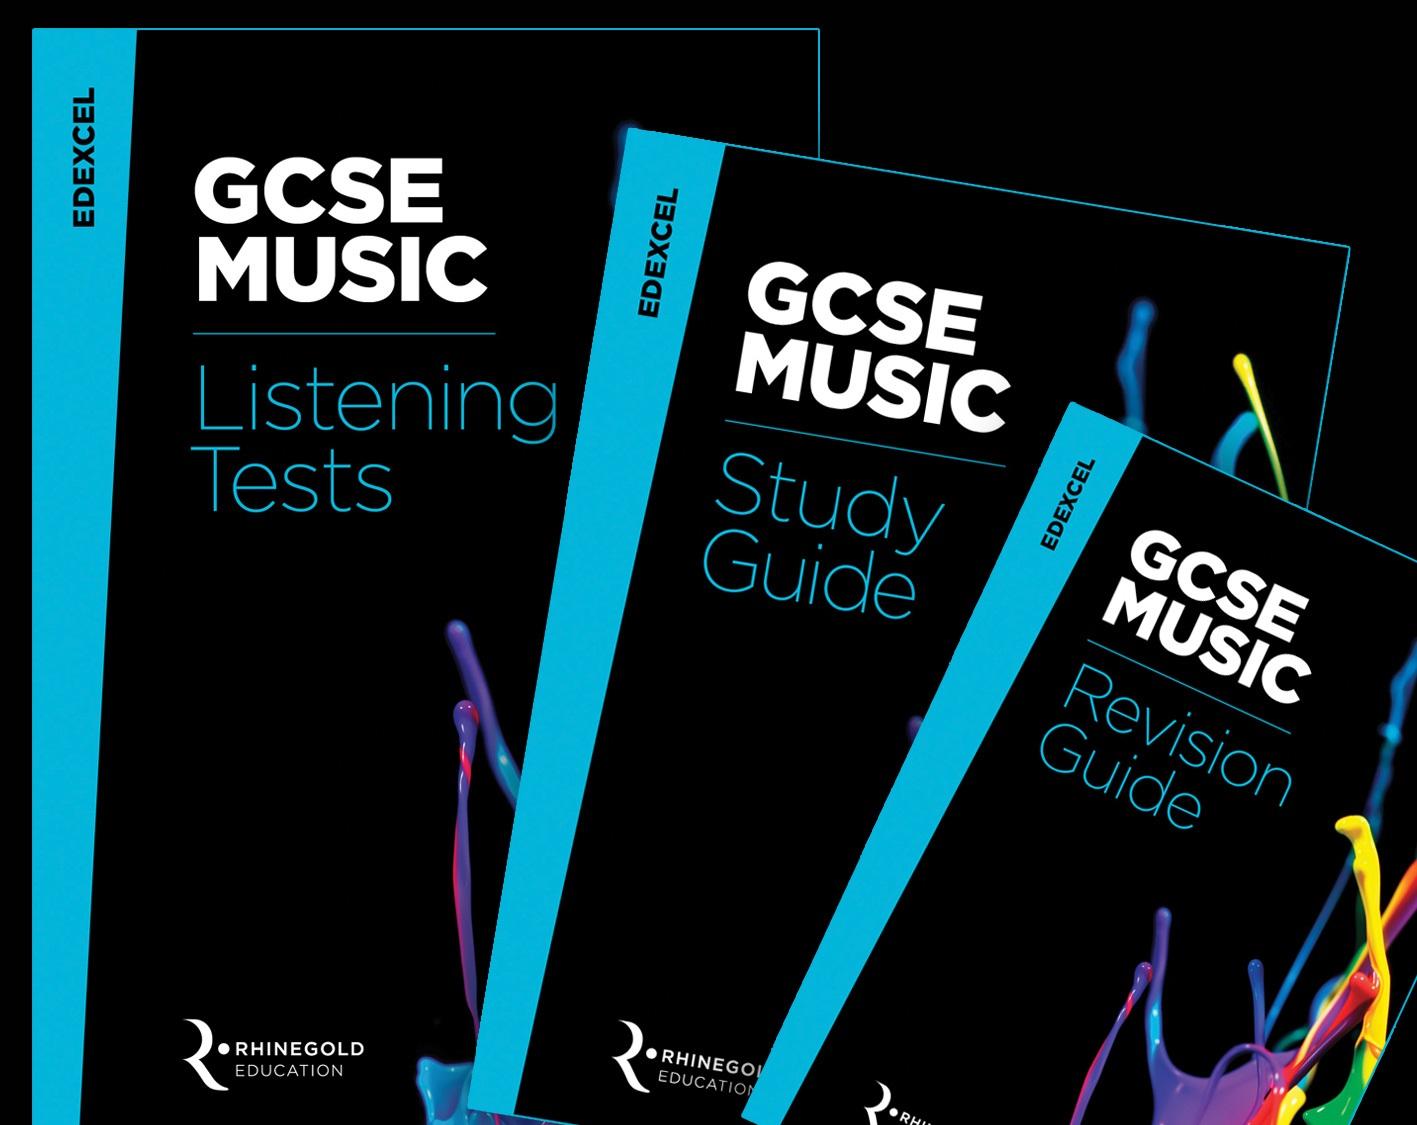 Rhinegold Education: Edexcel GCSE Music Exam Pack - Sheet Music  Downloads